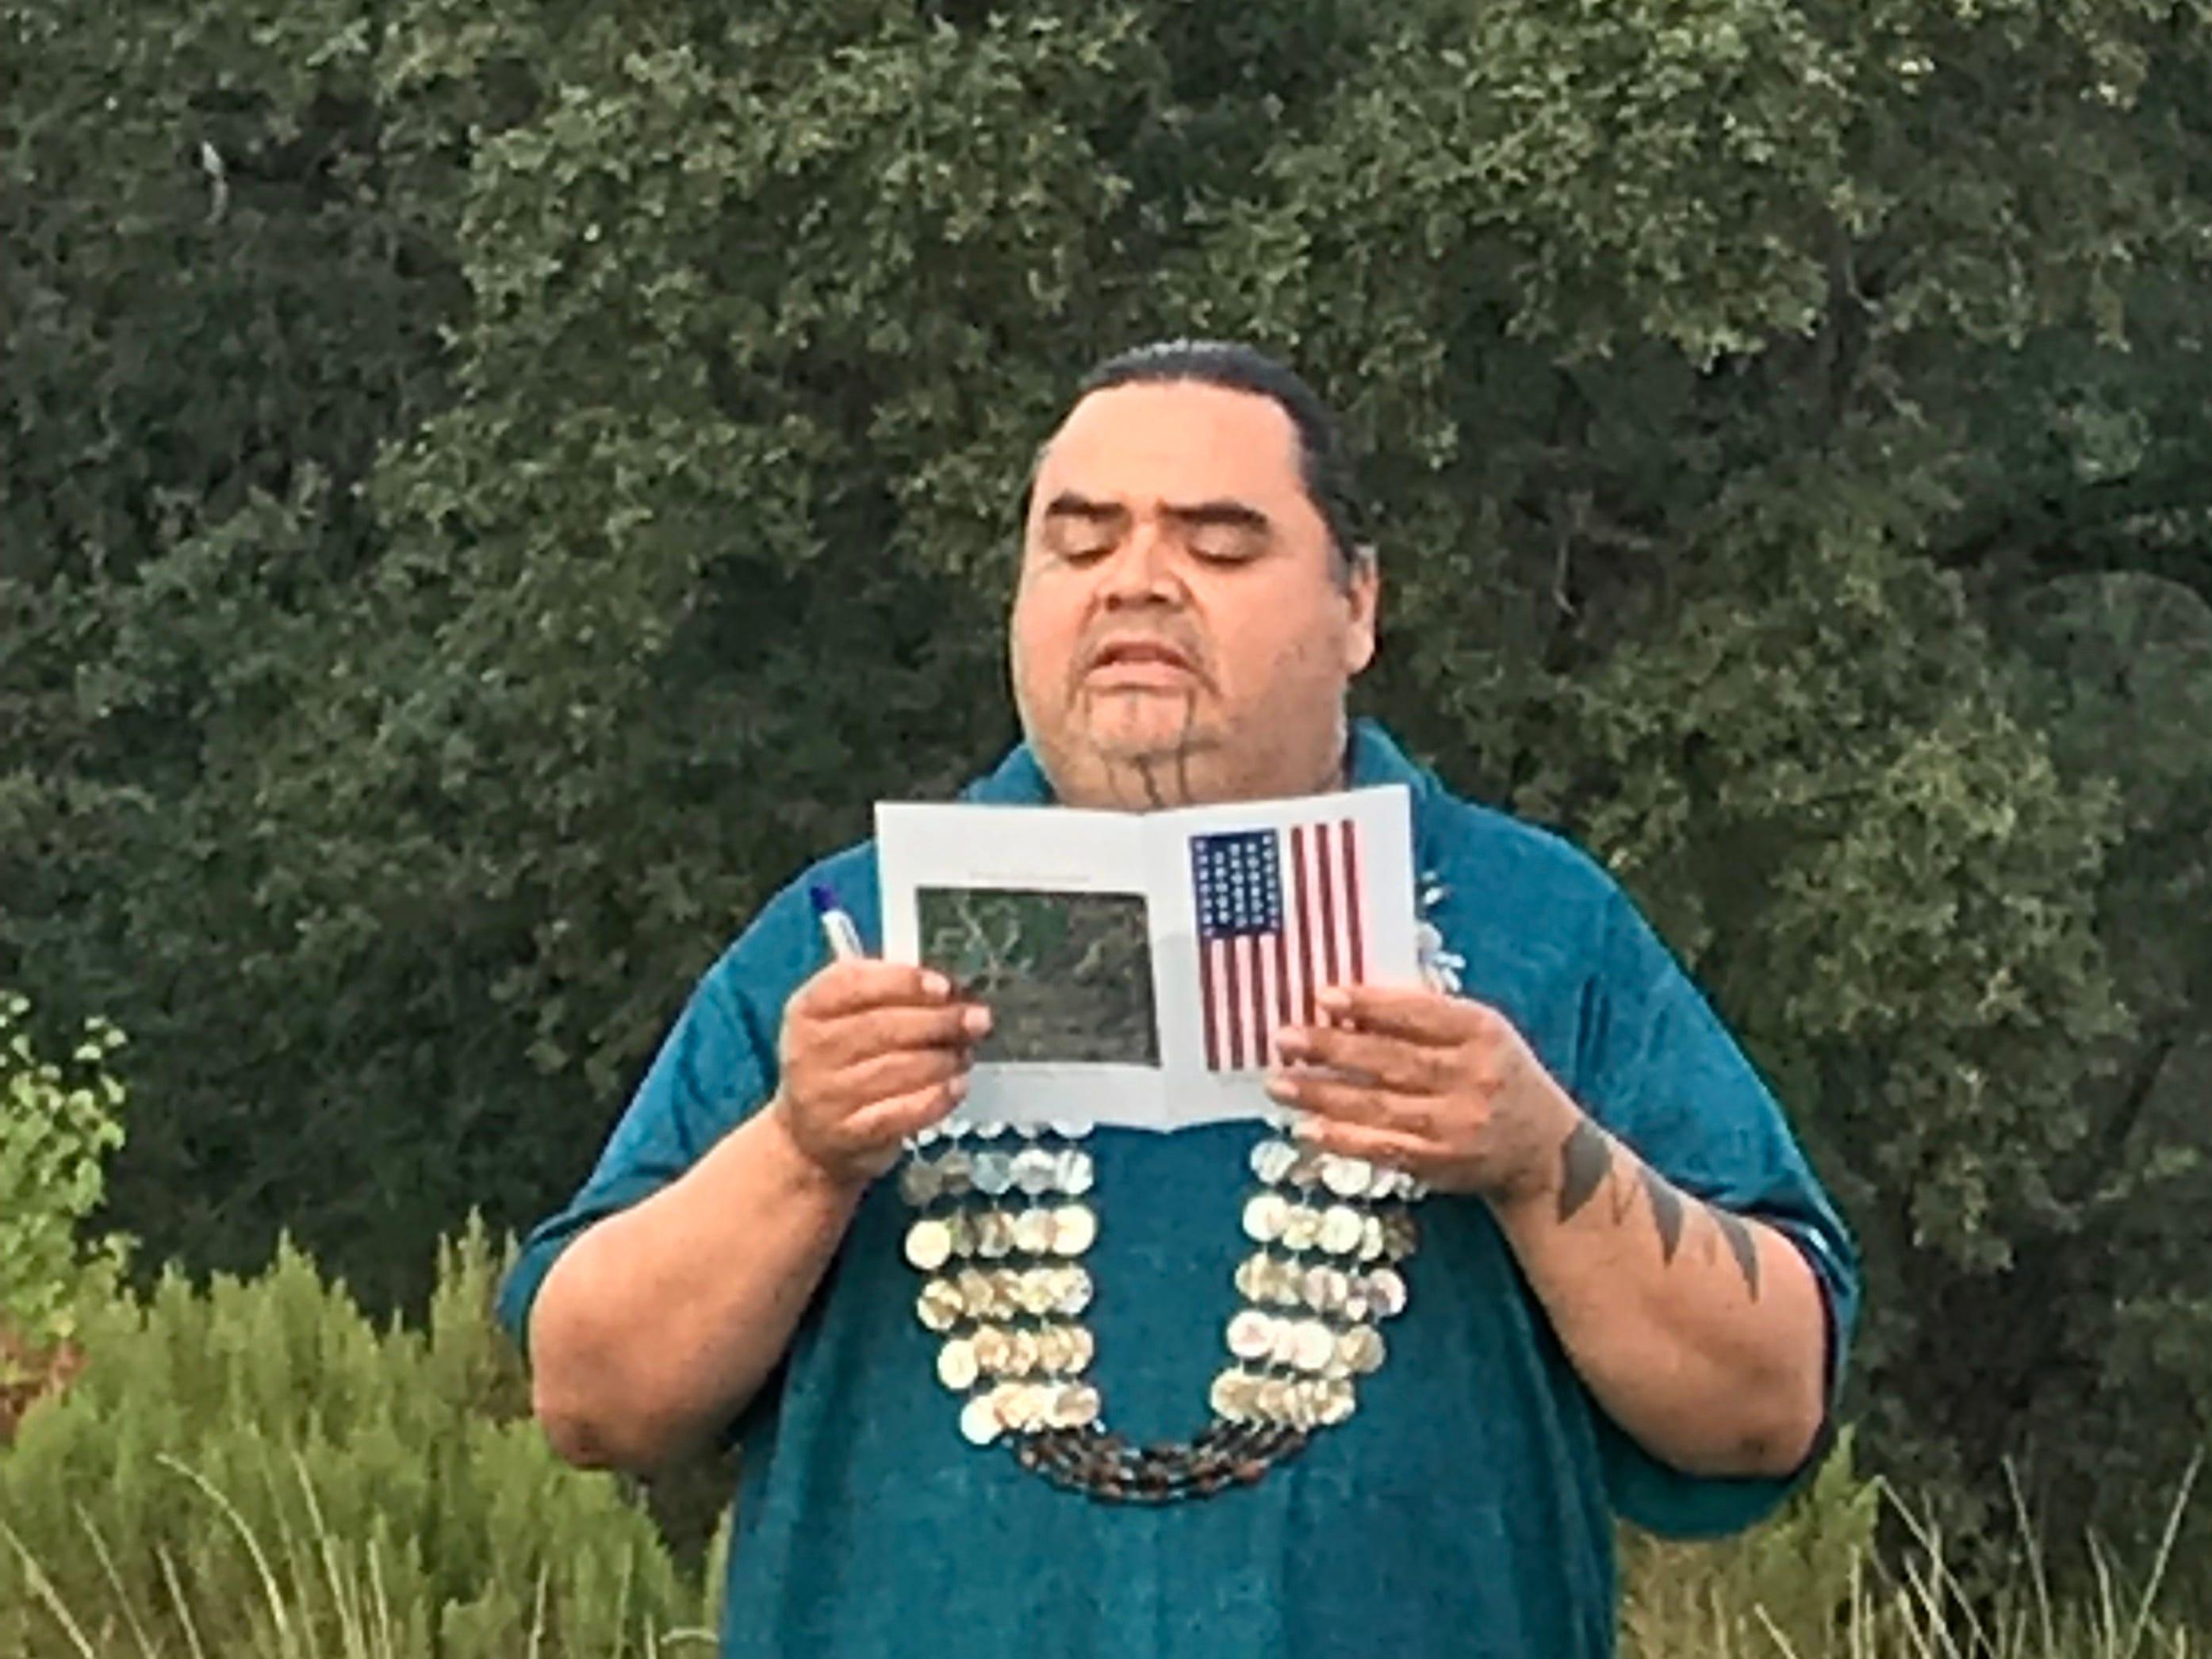 Healing ceremony for broken treaty, Carr Fire evacuees